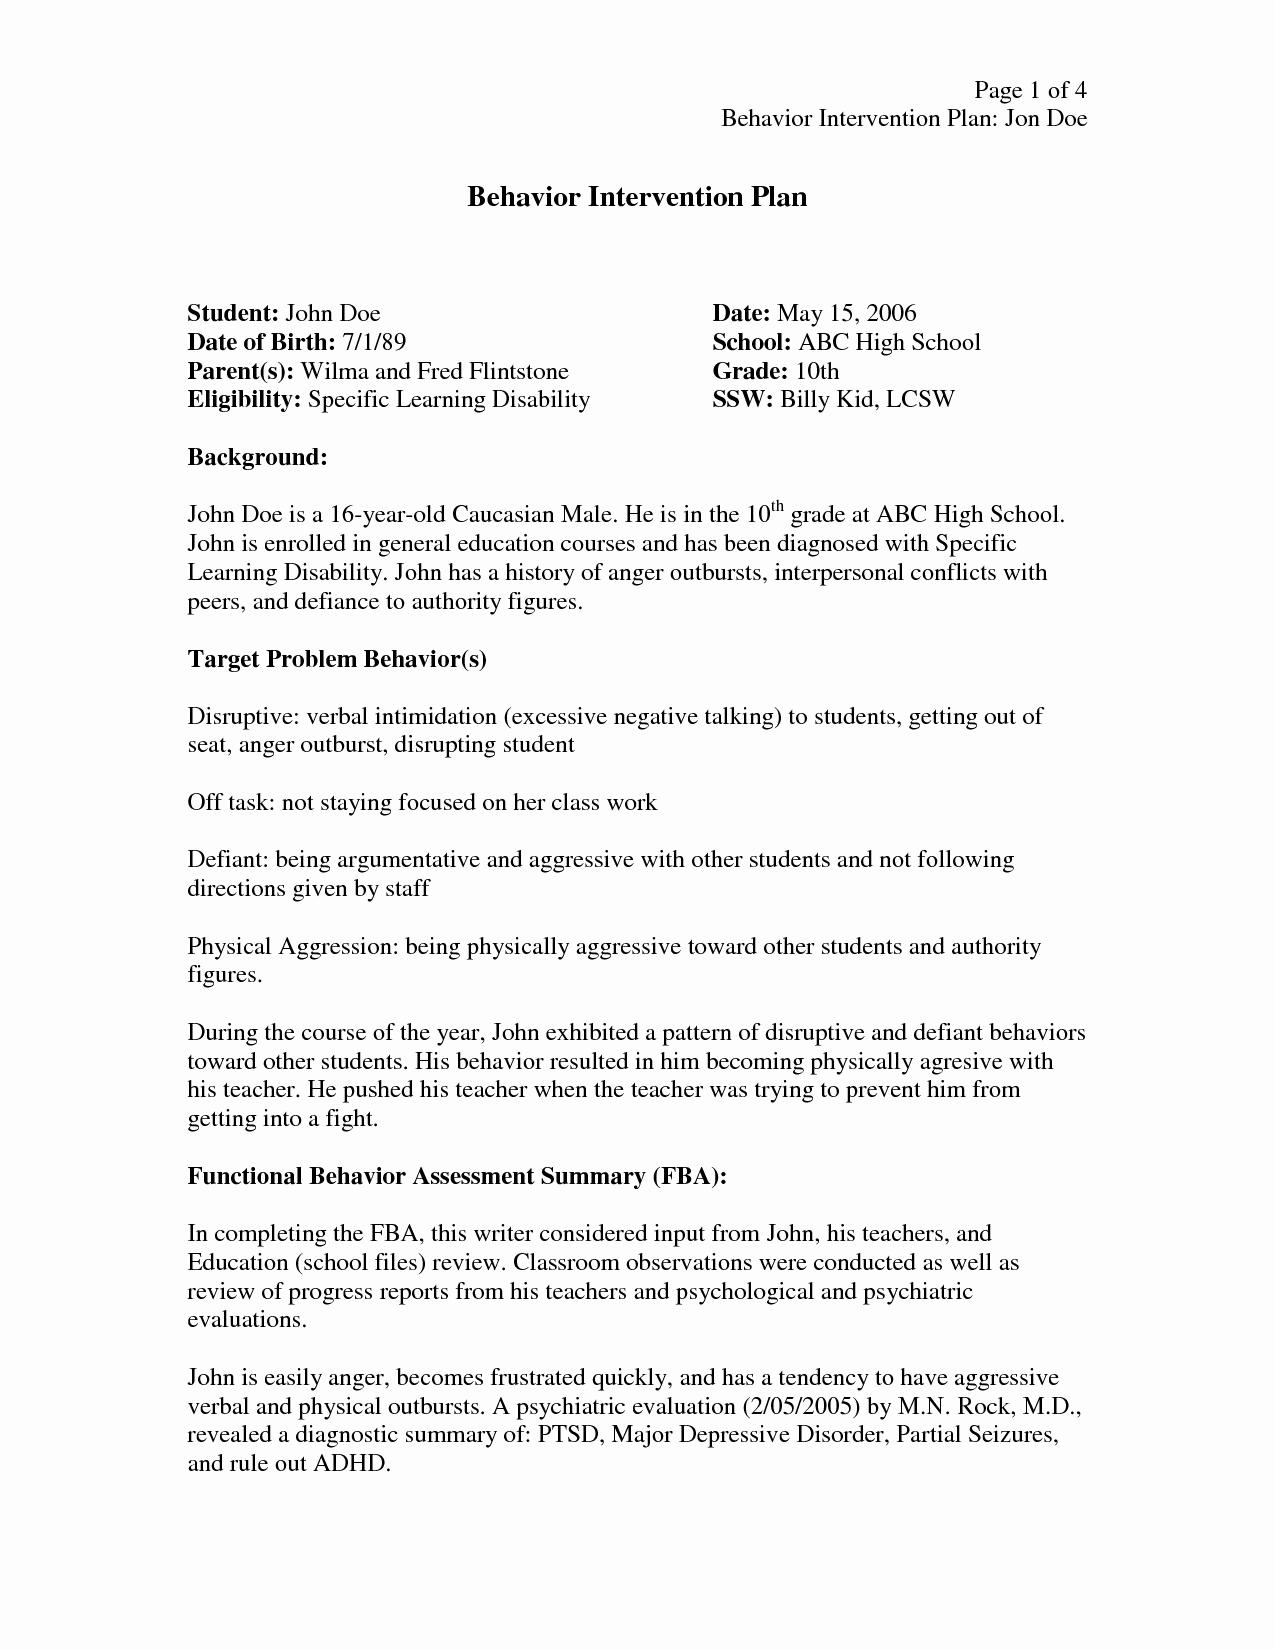 Behavior Intervention Plan Template Free Fresh Behavior Intervention Plan Template